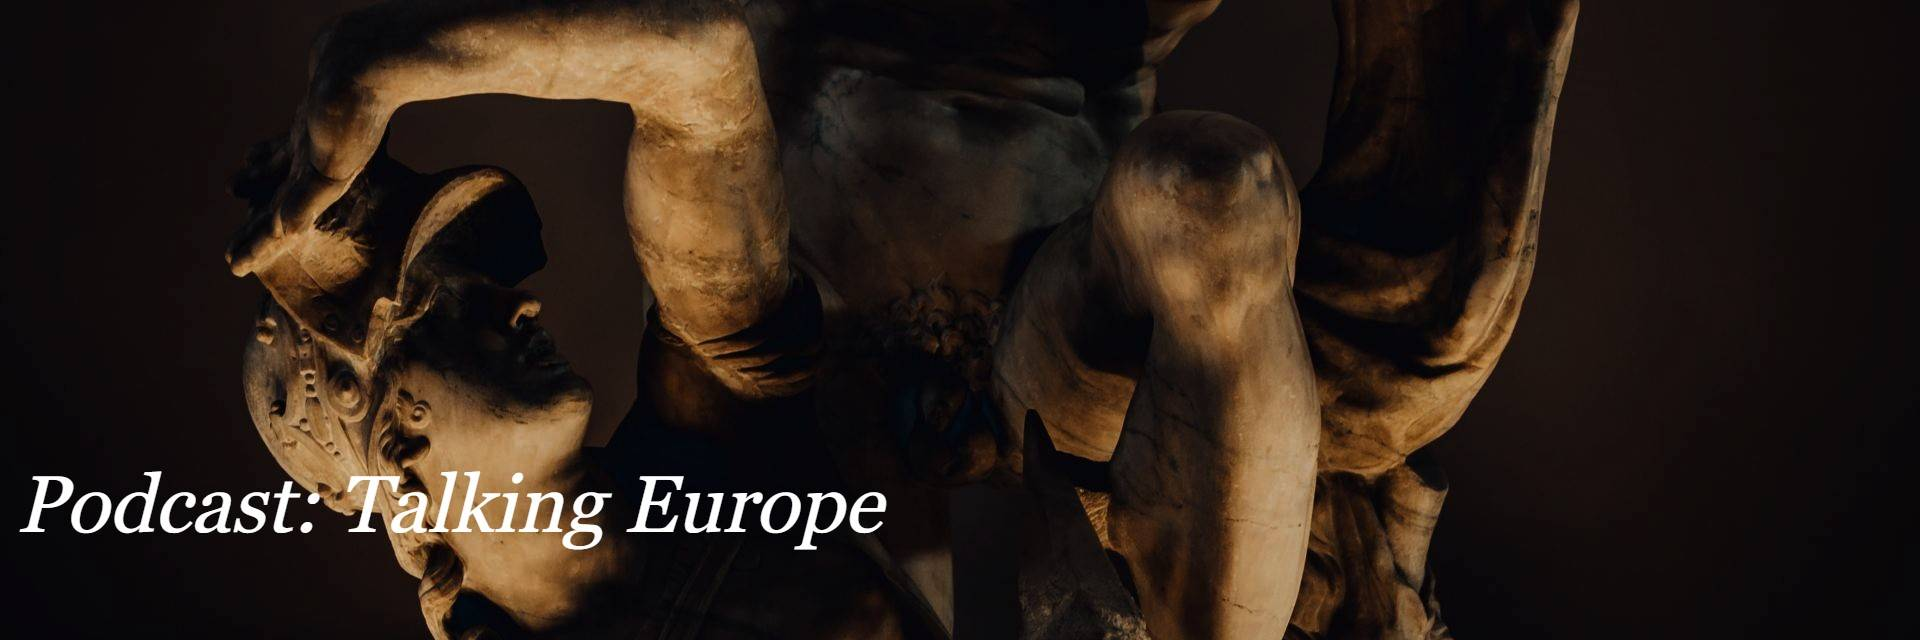 Podcast: Talking Europe